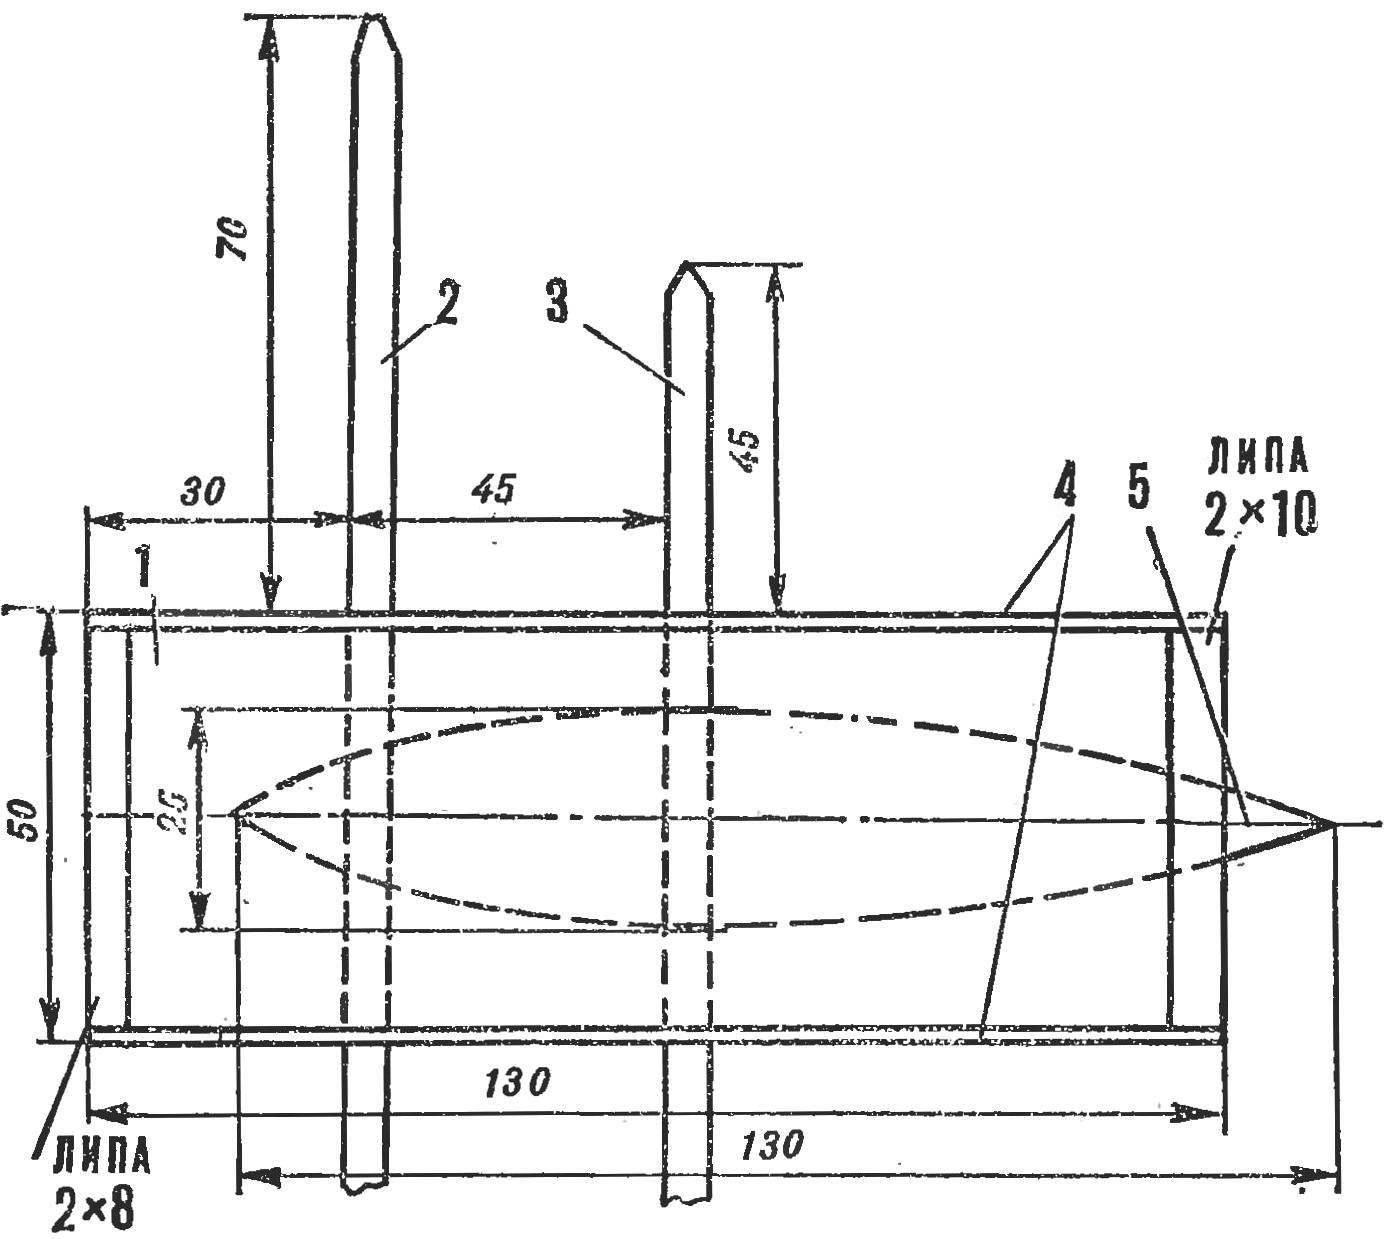 Fig. 5. Pylon center section